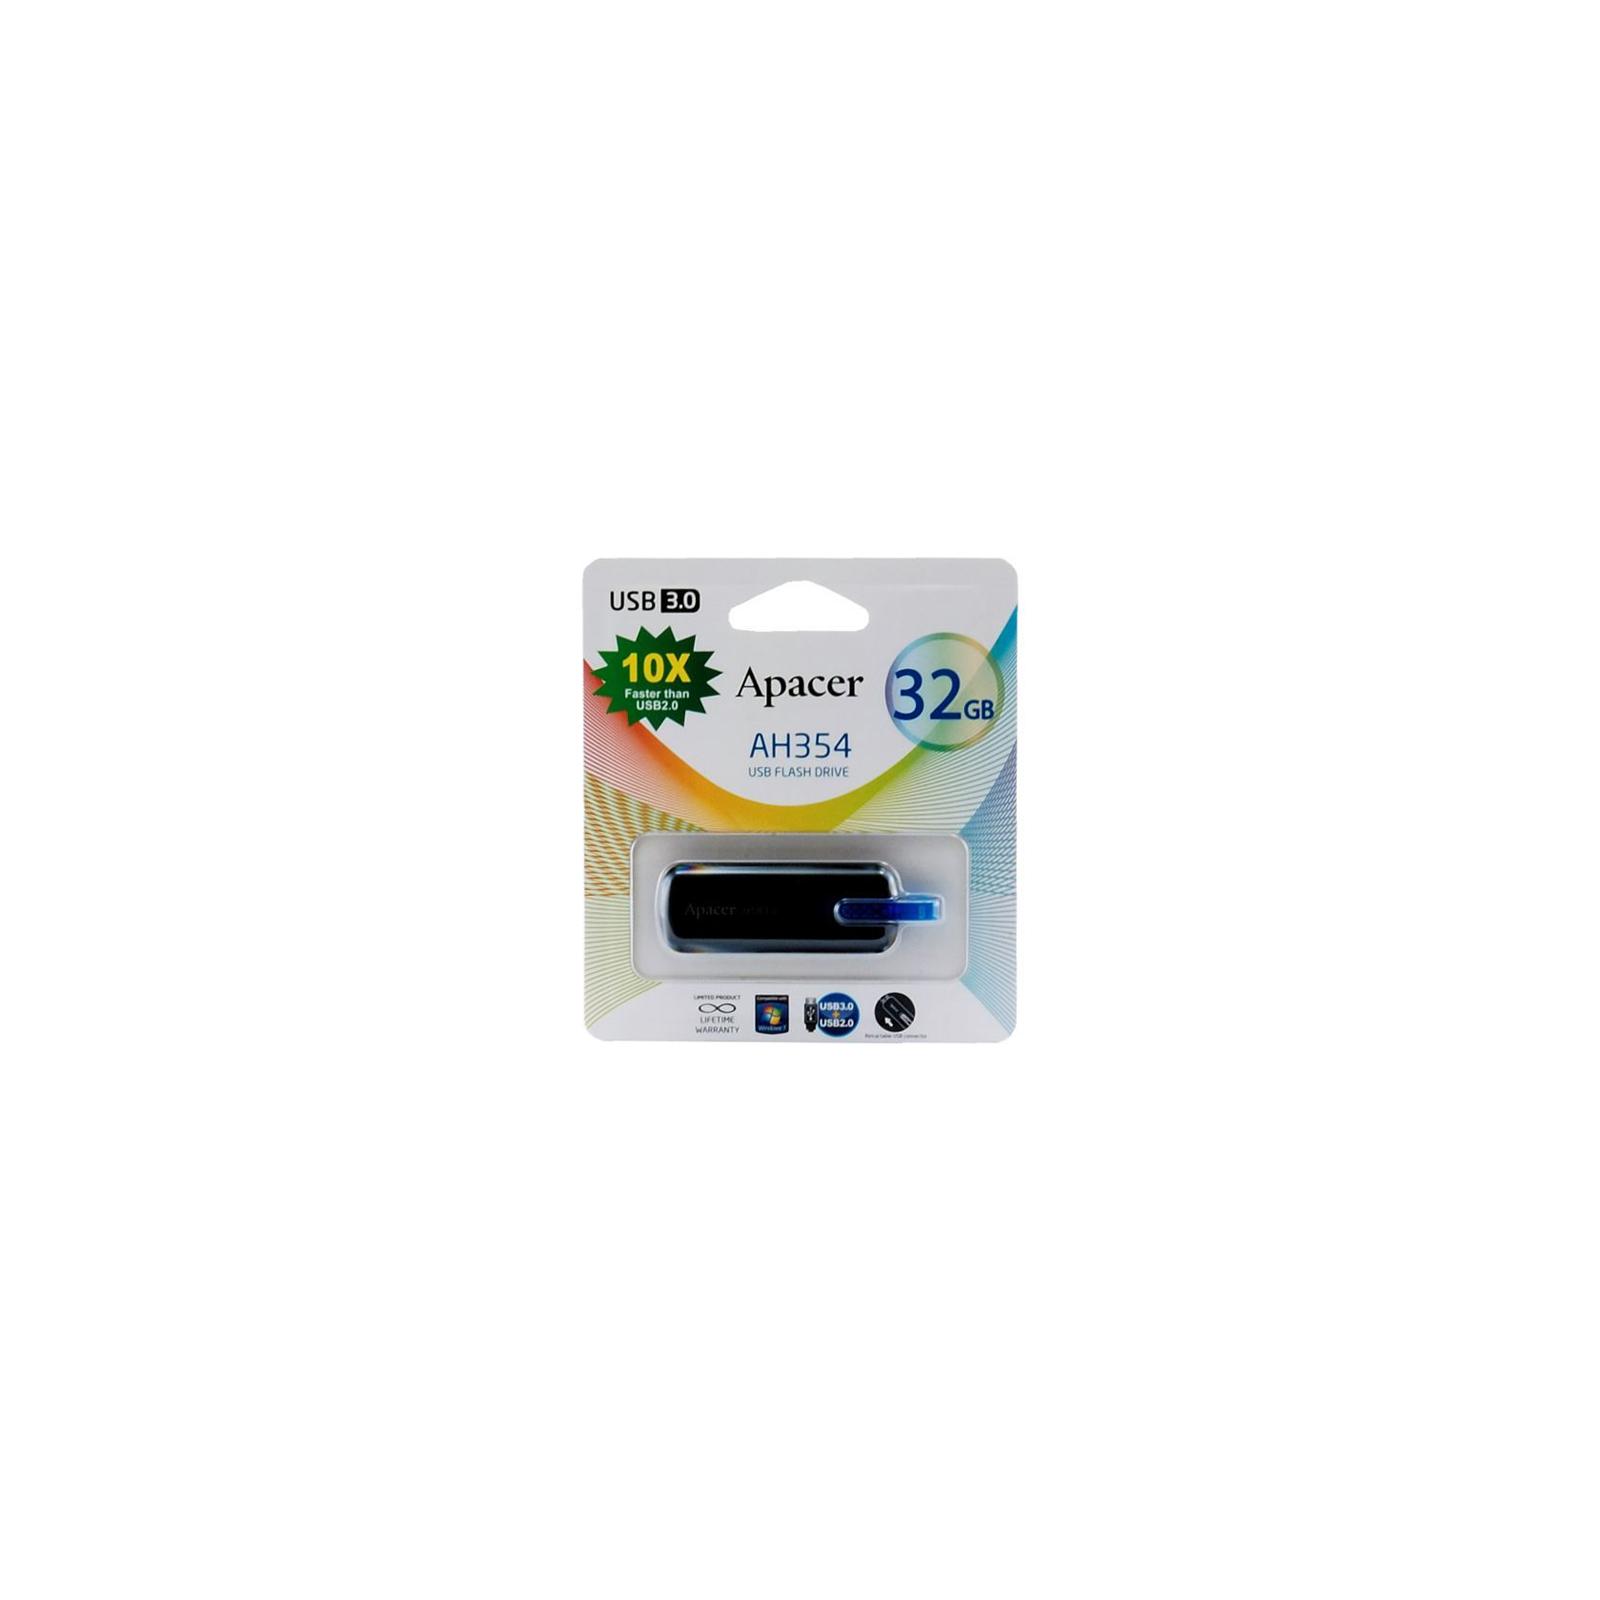 USB флеш накопитель 32GB AH354 Black RP USB3.0 Apacer (AP32GAH354B-1) изображение 9